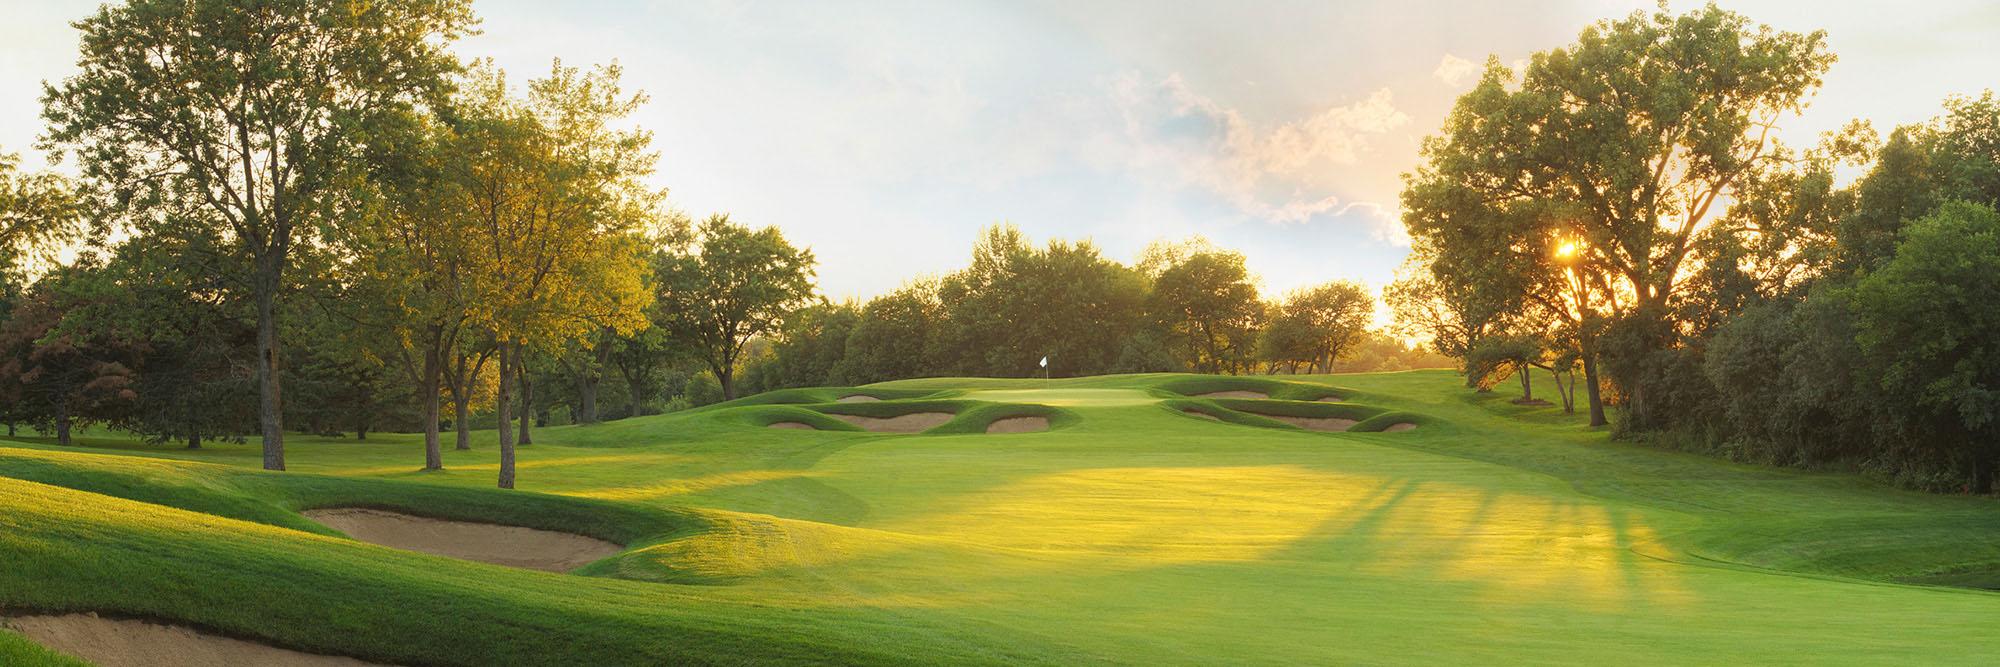 Golf Course Image - Cog Hill 4 No. 7